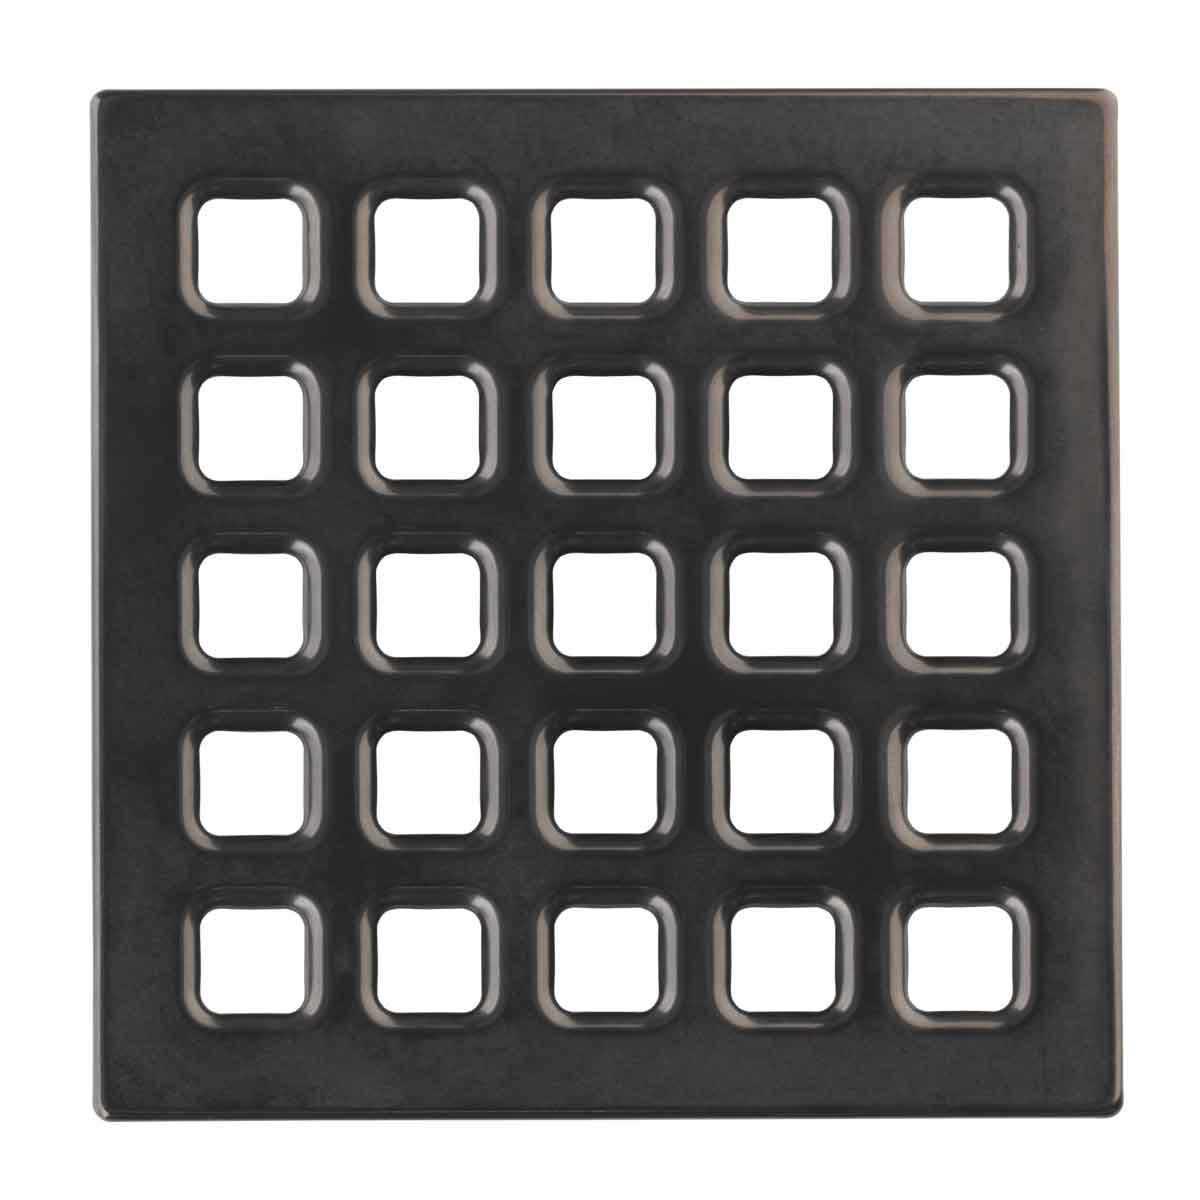 Black Chrome Durock Pro Series 4 inch Grate 170157